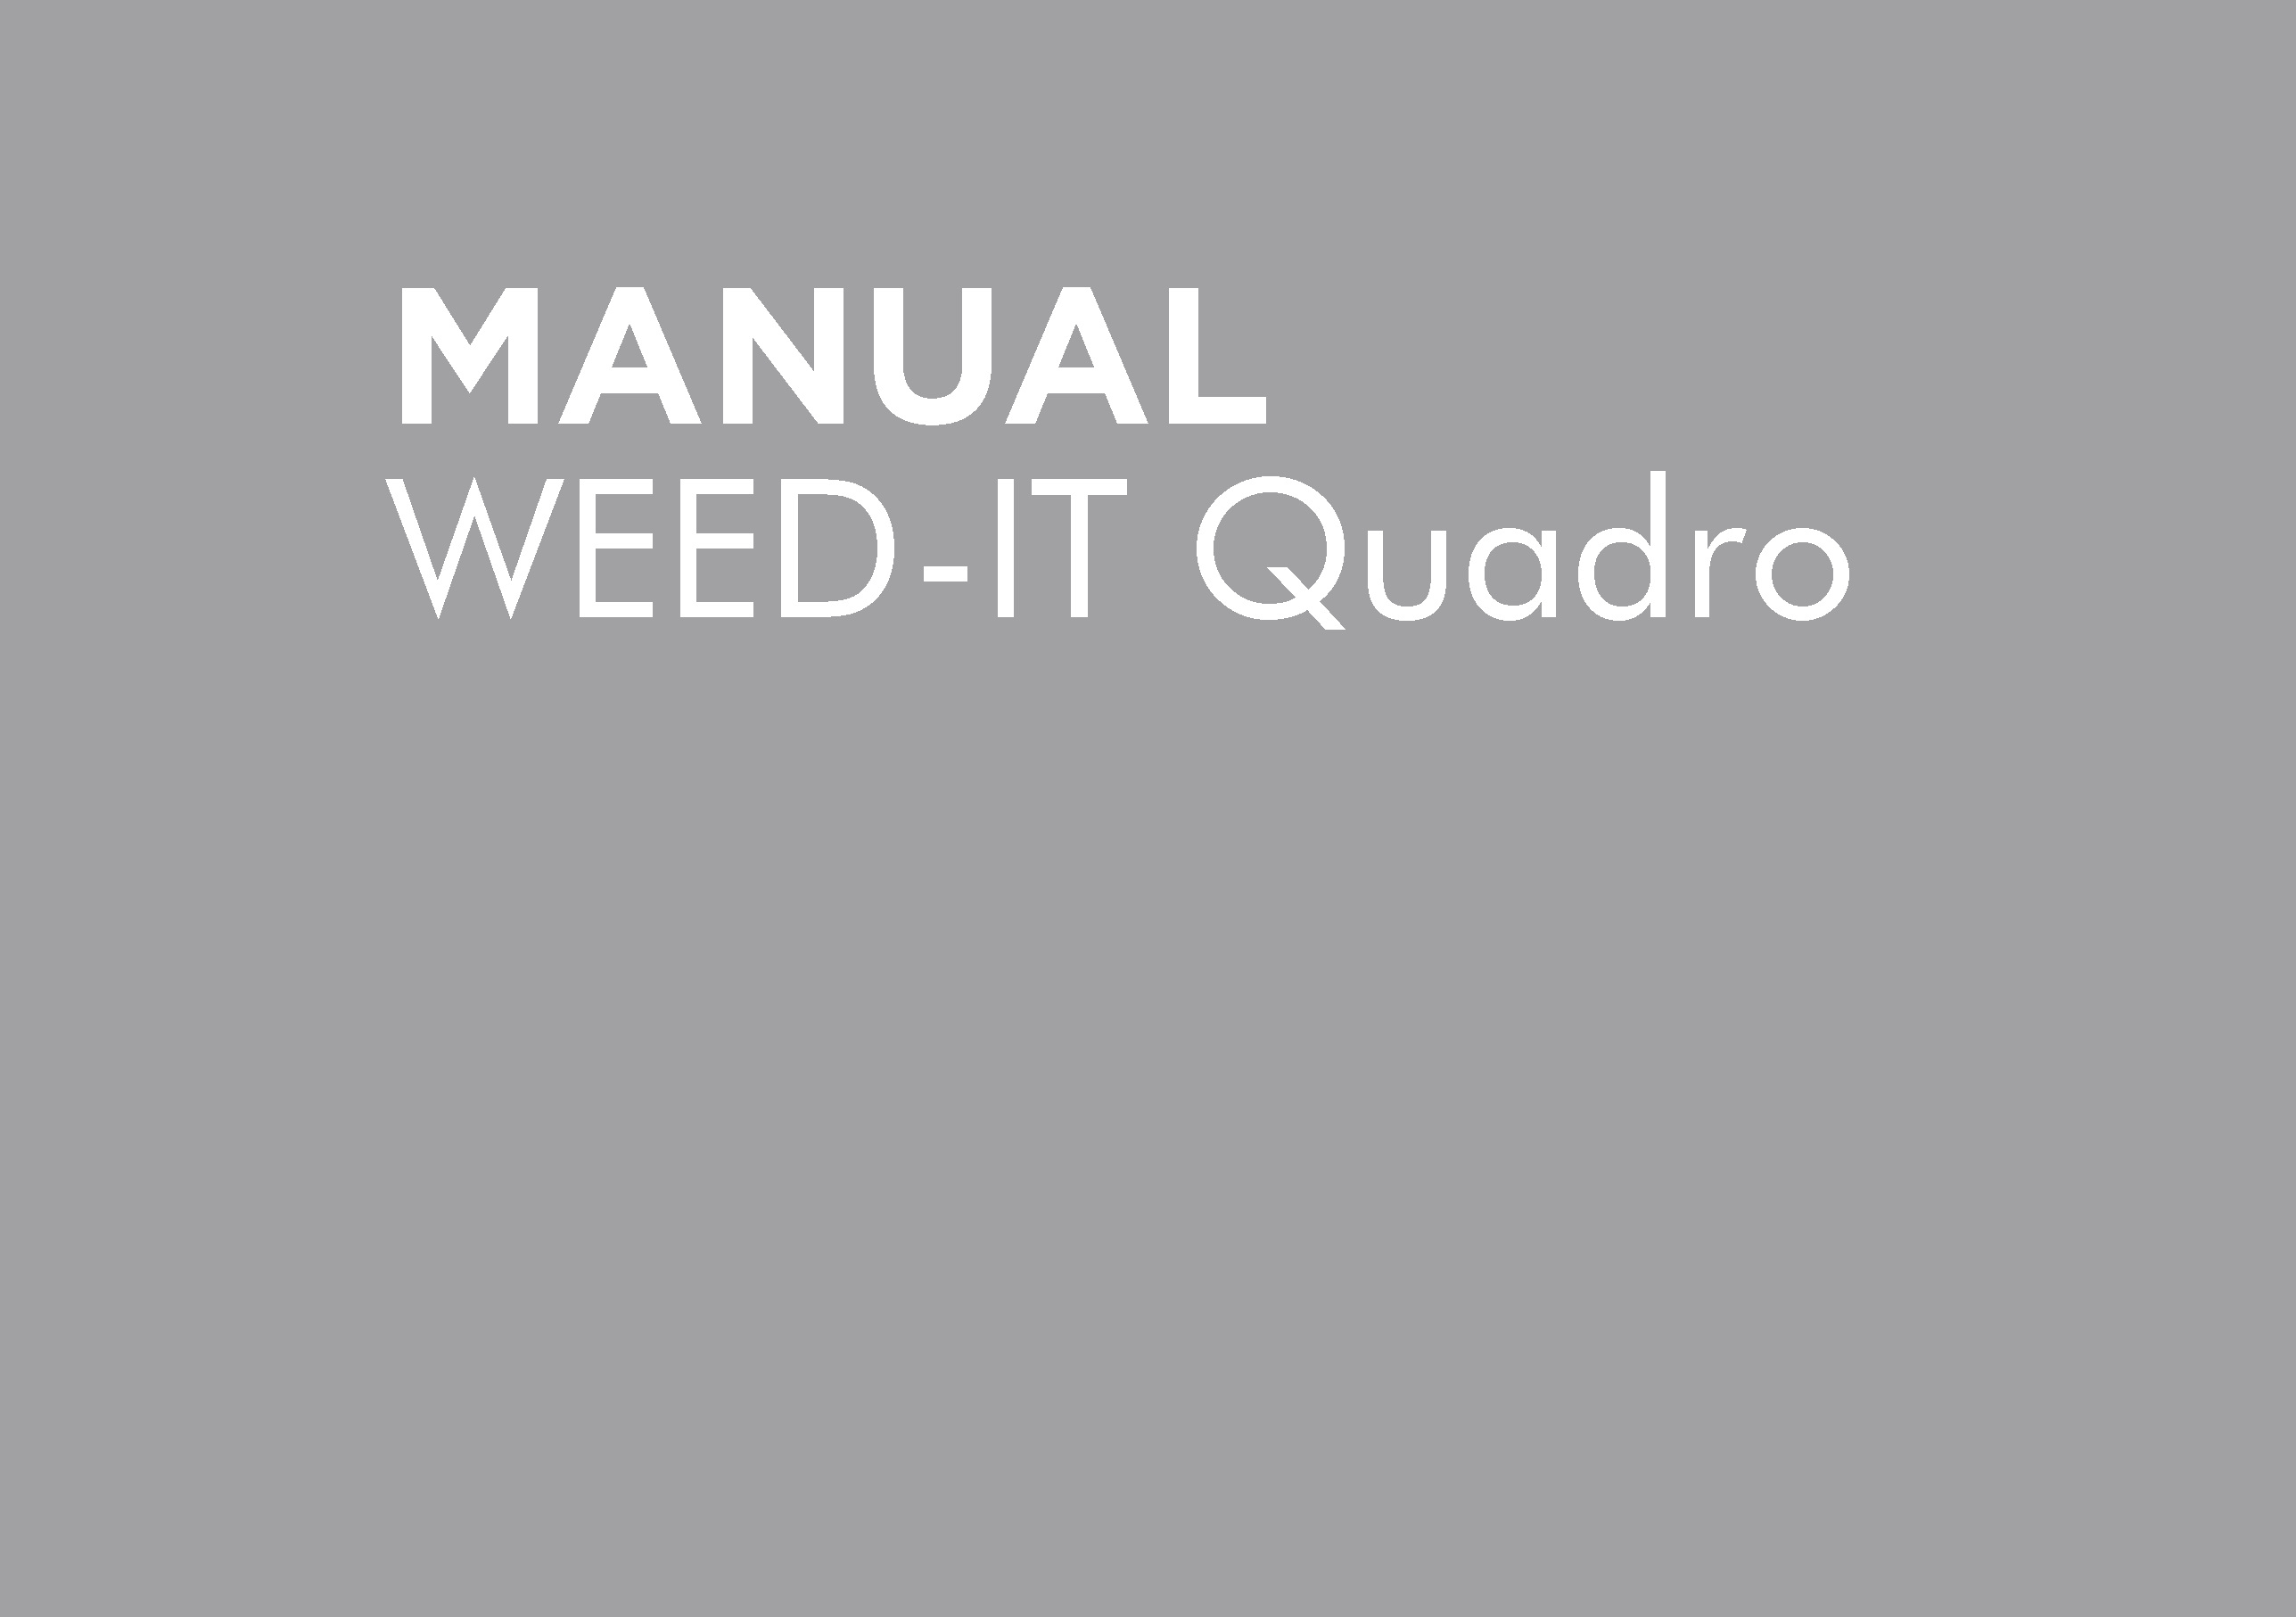 BT-PMWEEDQ-B – WEEDIT QUADRO PARTS MANUAL